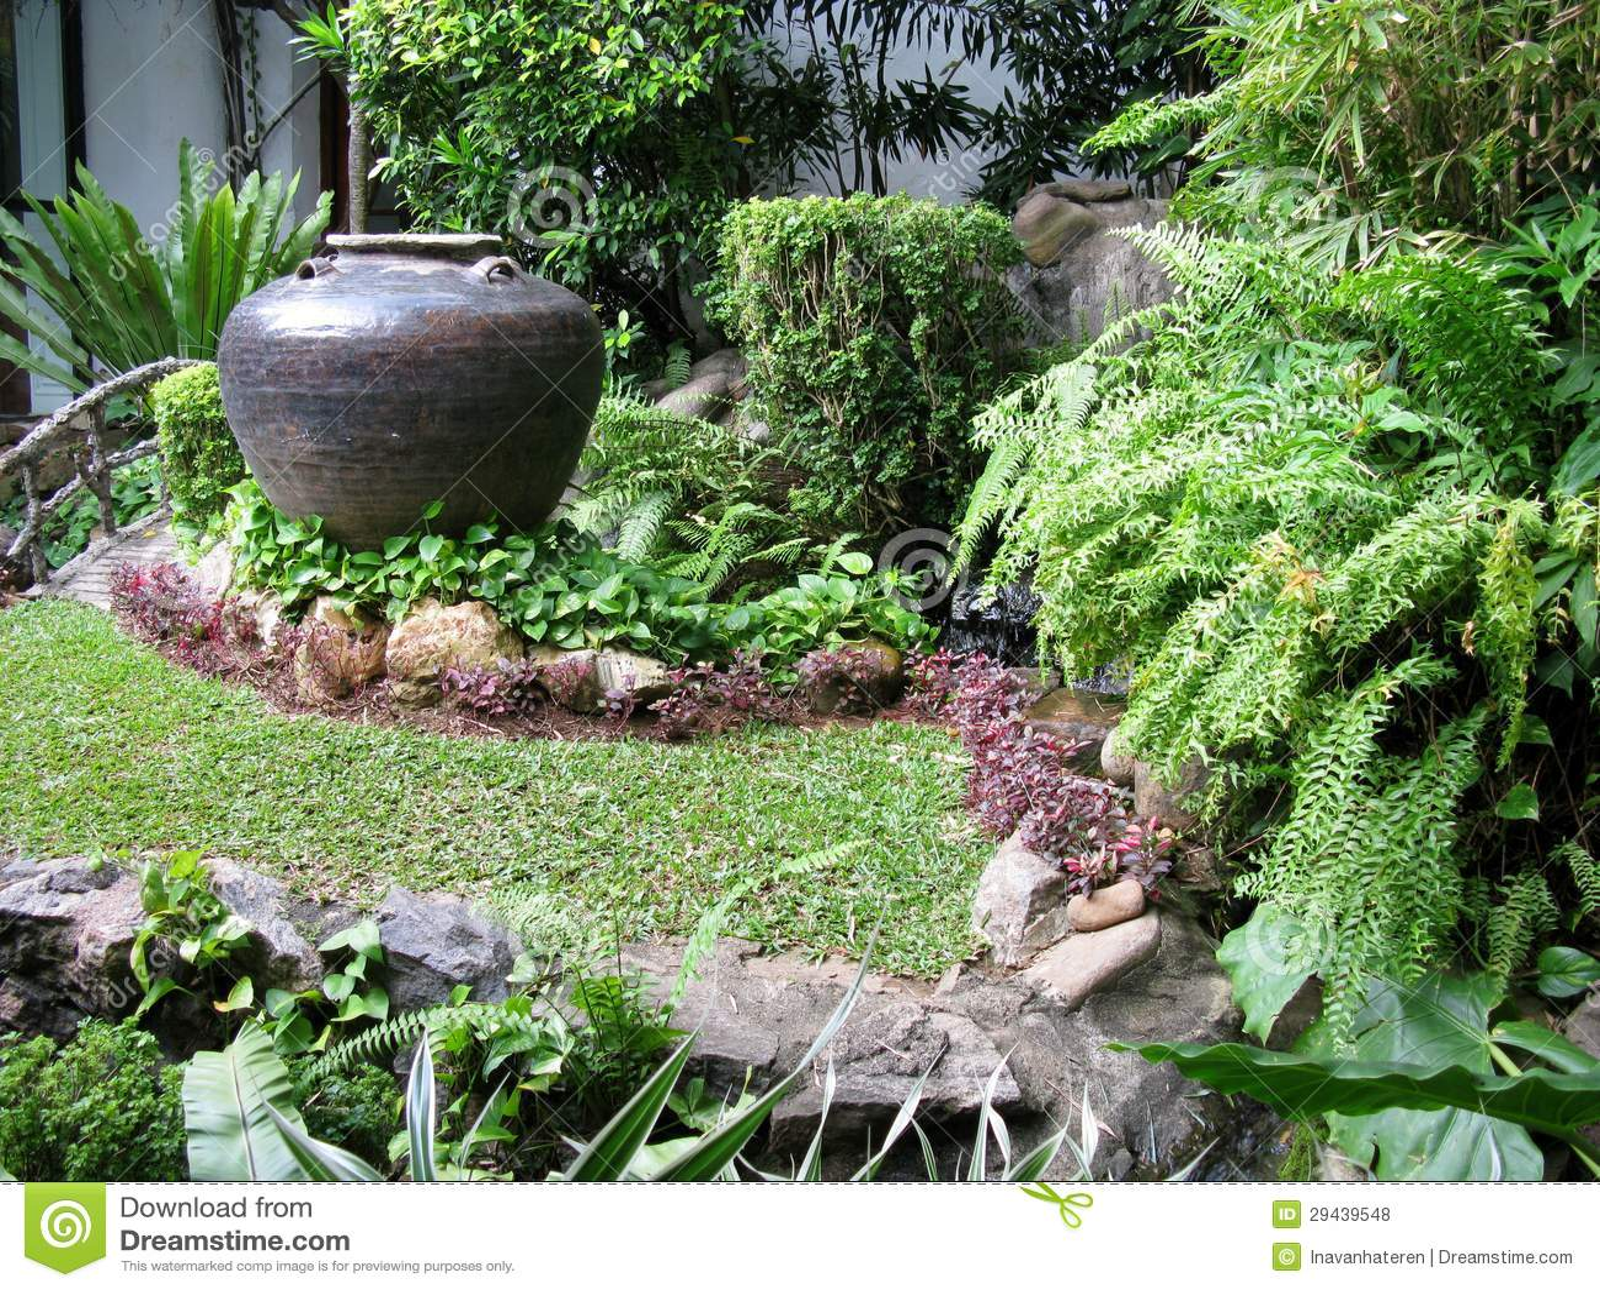 plantas jardim tropical : plantas jardim tropical:Plantas Tropicais Em Um Jardim Fotos de Stock Royalty Free – Imagem